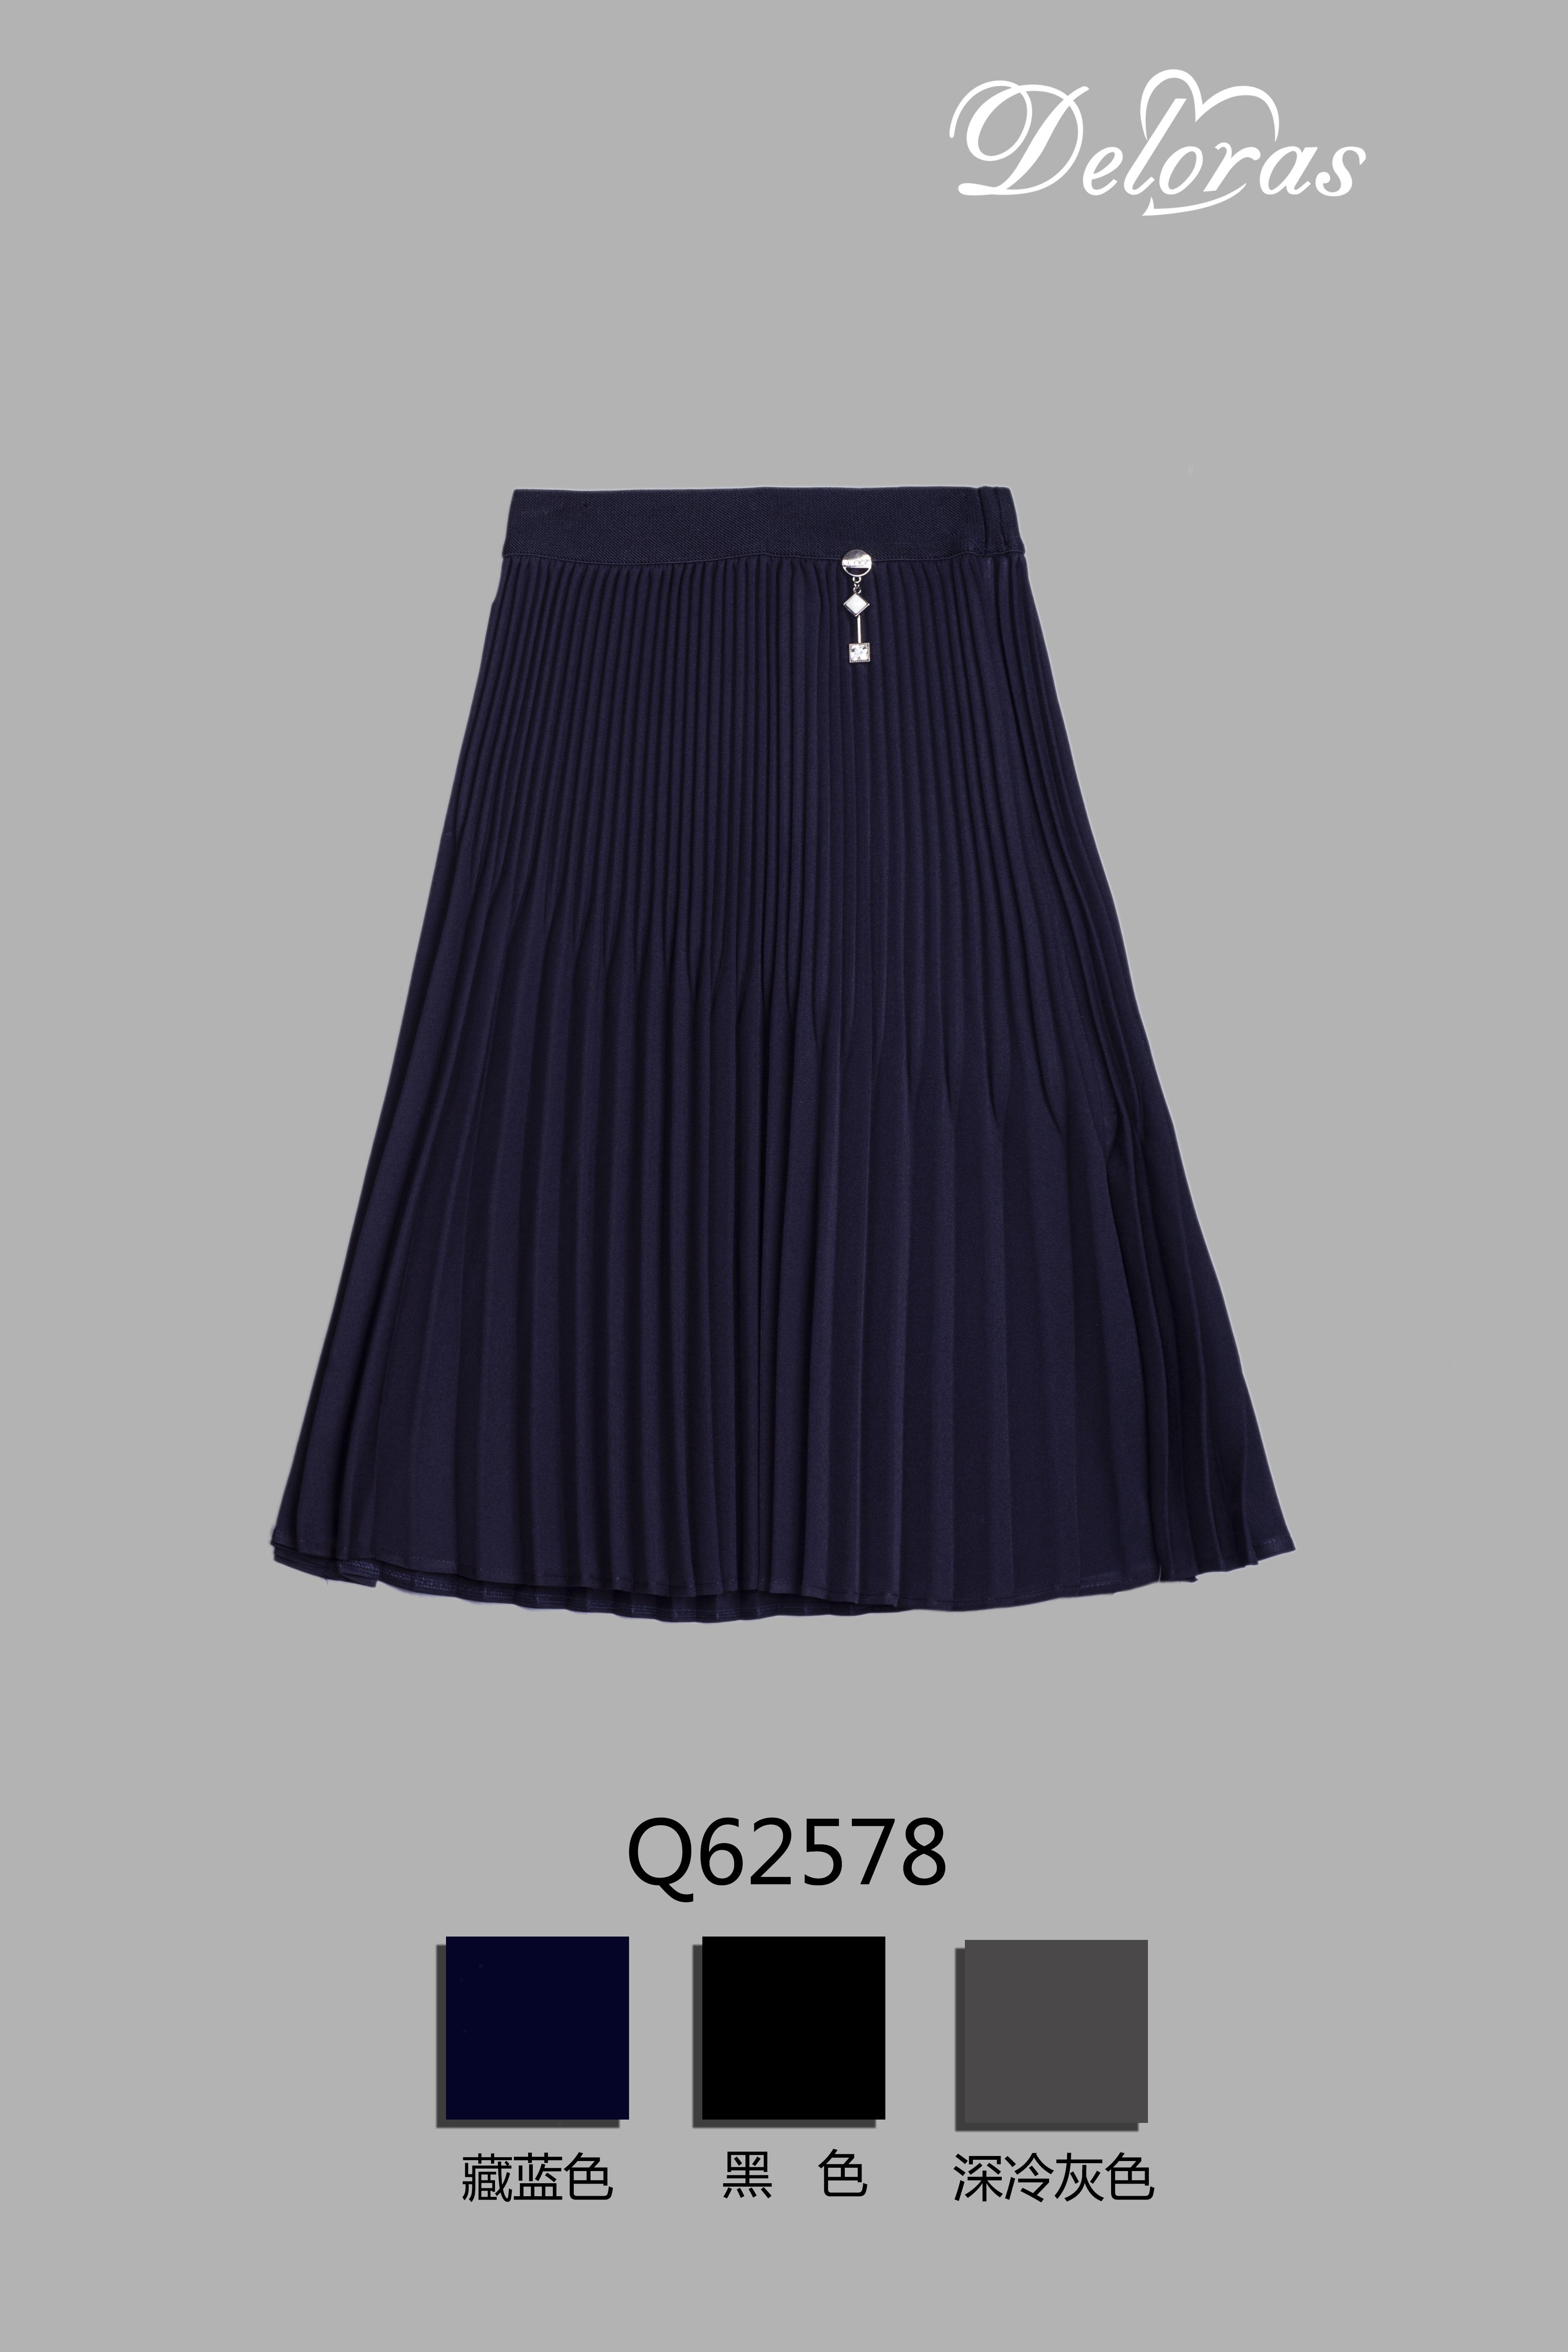 Юбка для девочки YGDL62578